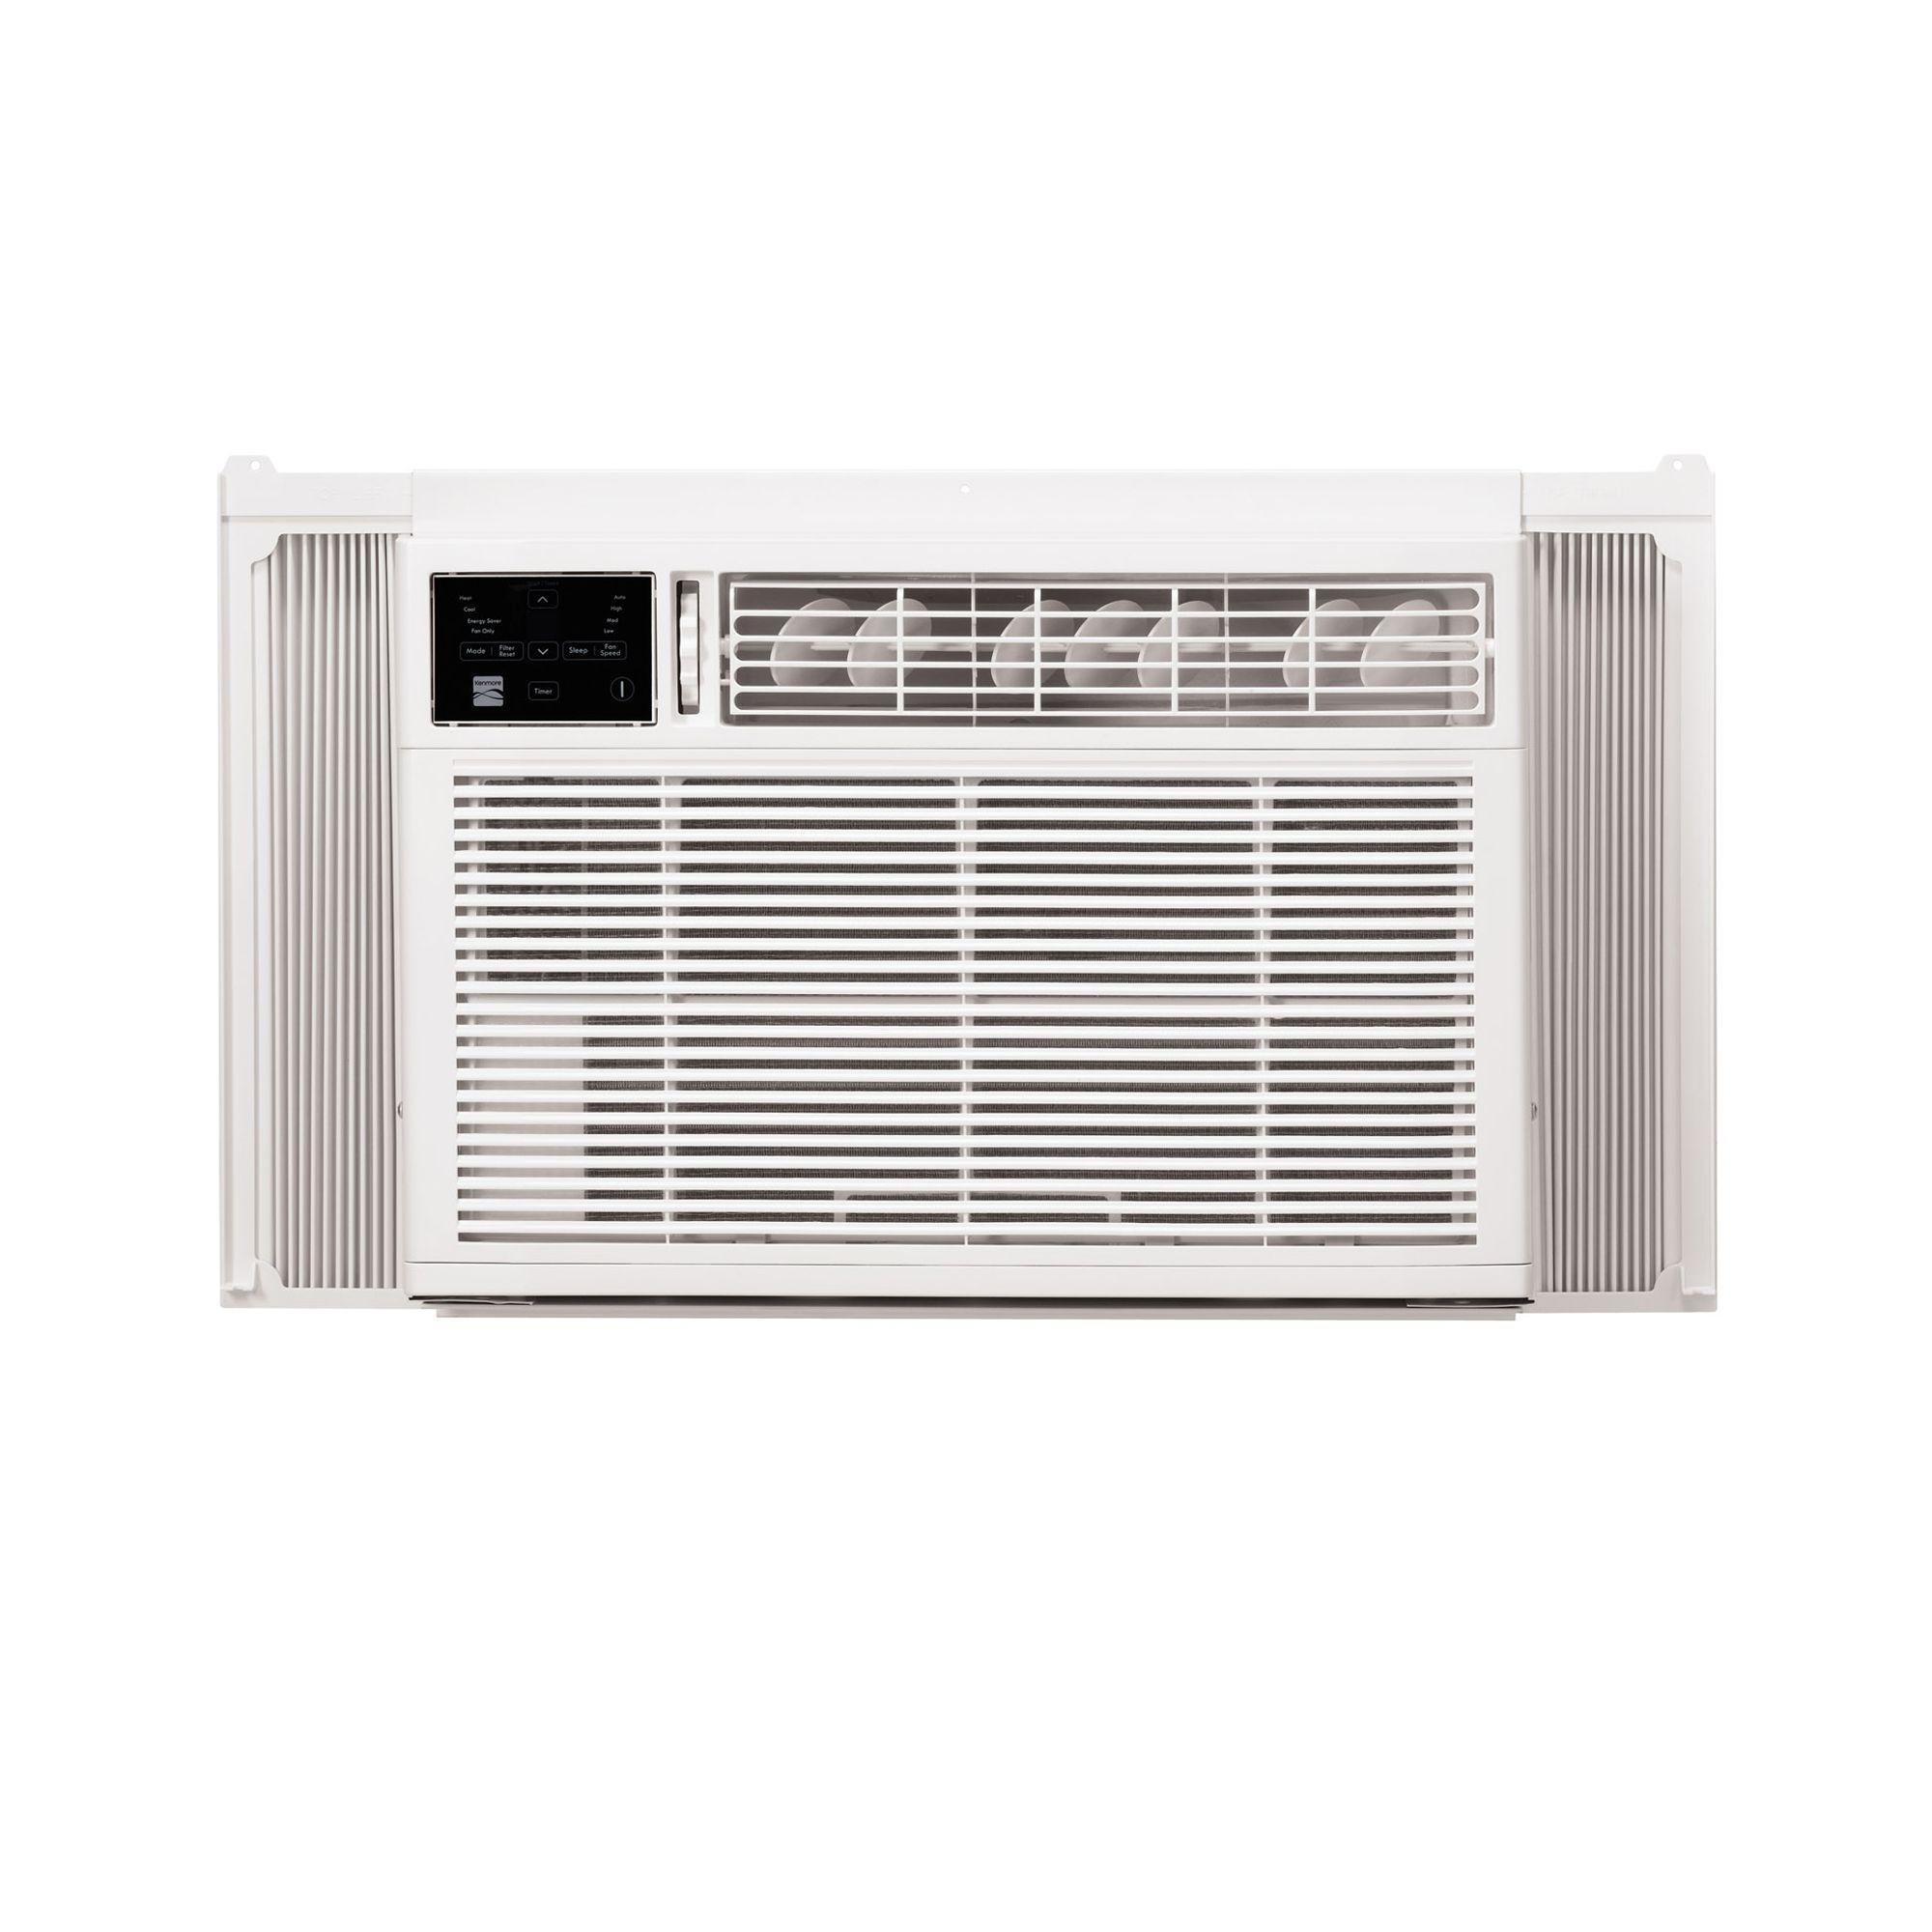 Kenmore 12,000 BTU Room Air Conditioner